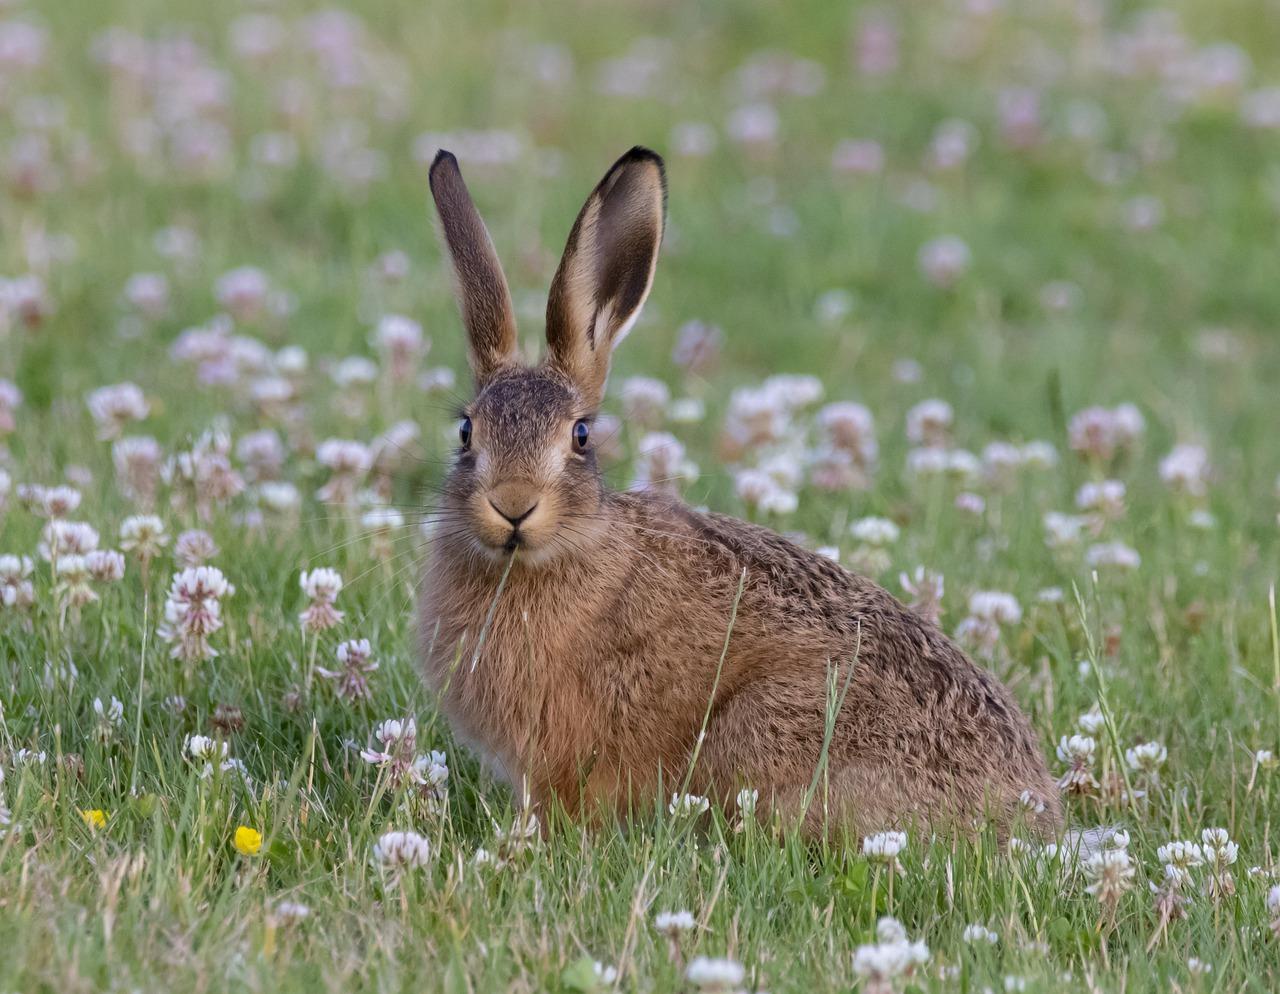 За двумя зайцами погонишься – ни одного не поймаешь - пословица